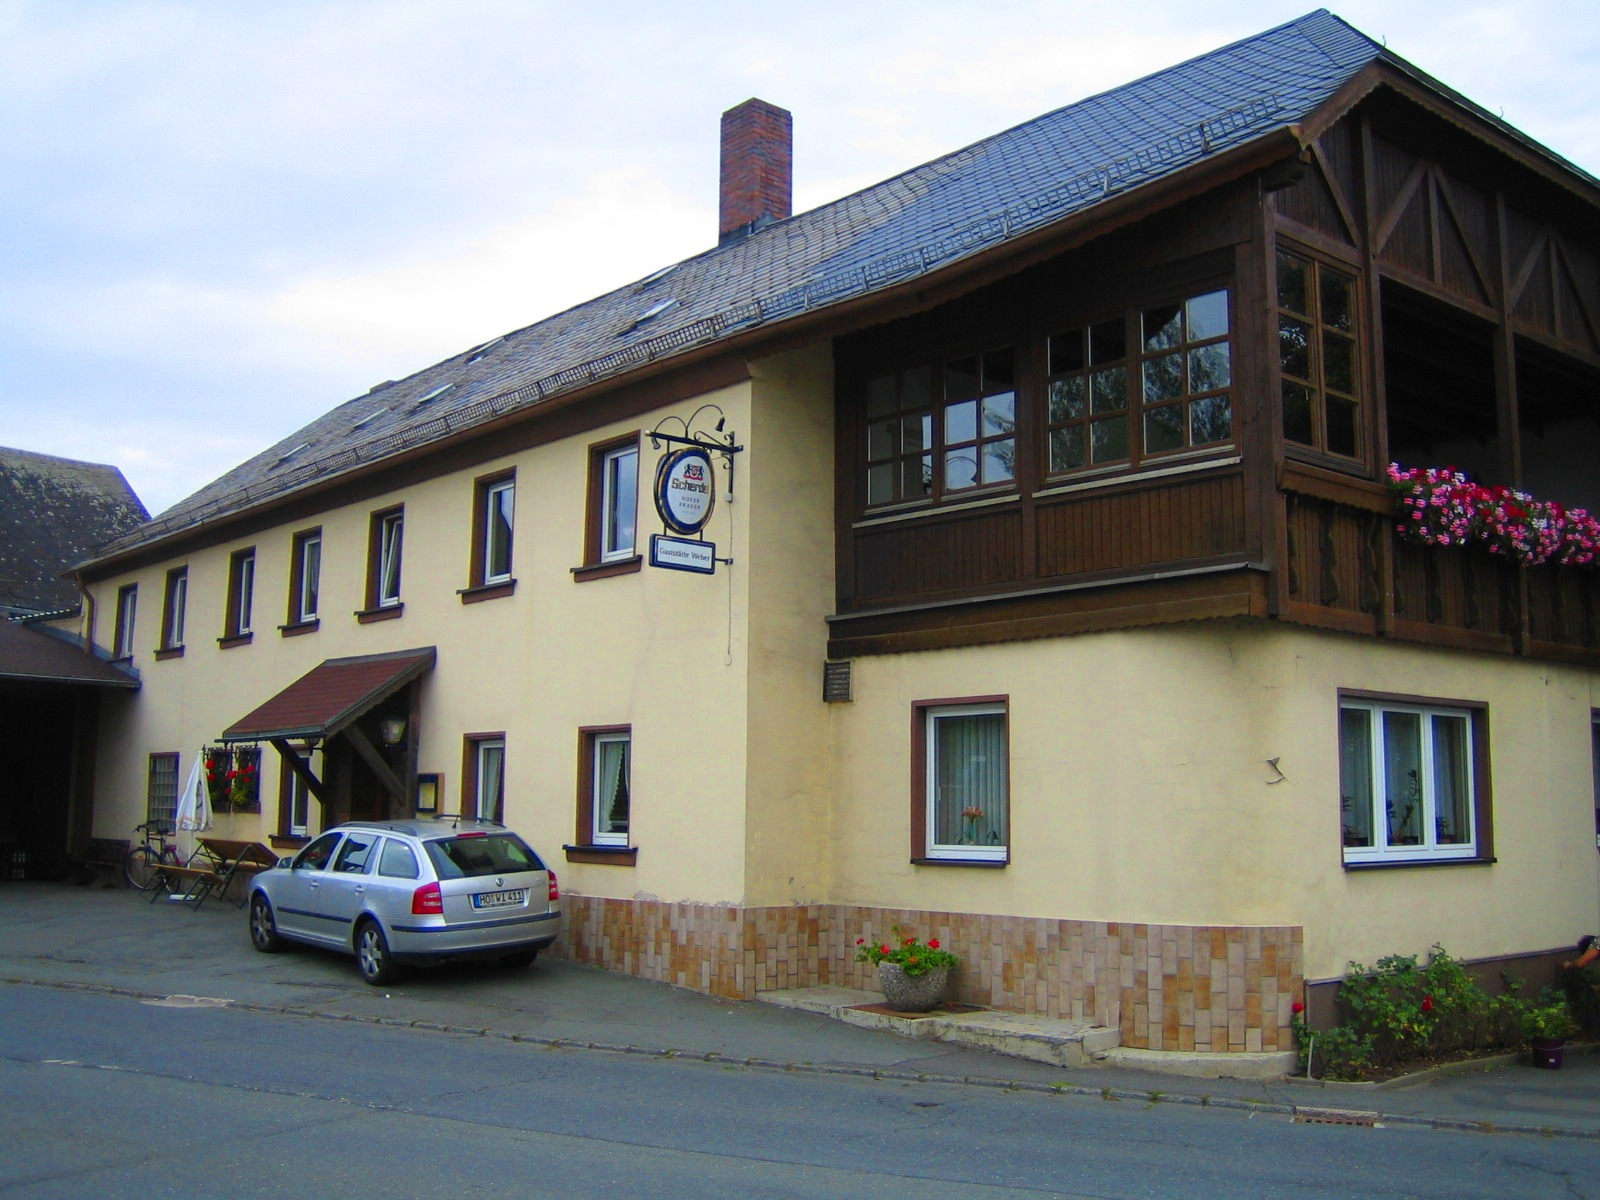 Gaststätte Weber in Leupoldsgrün